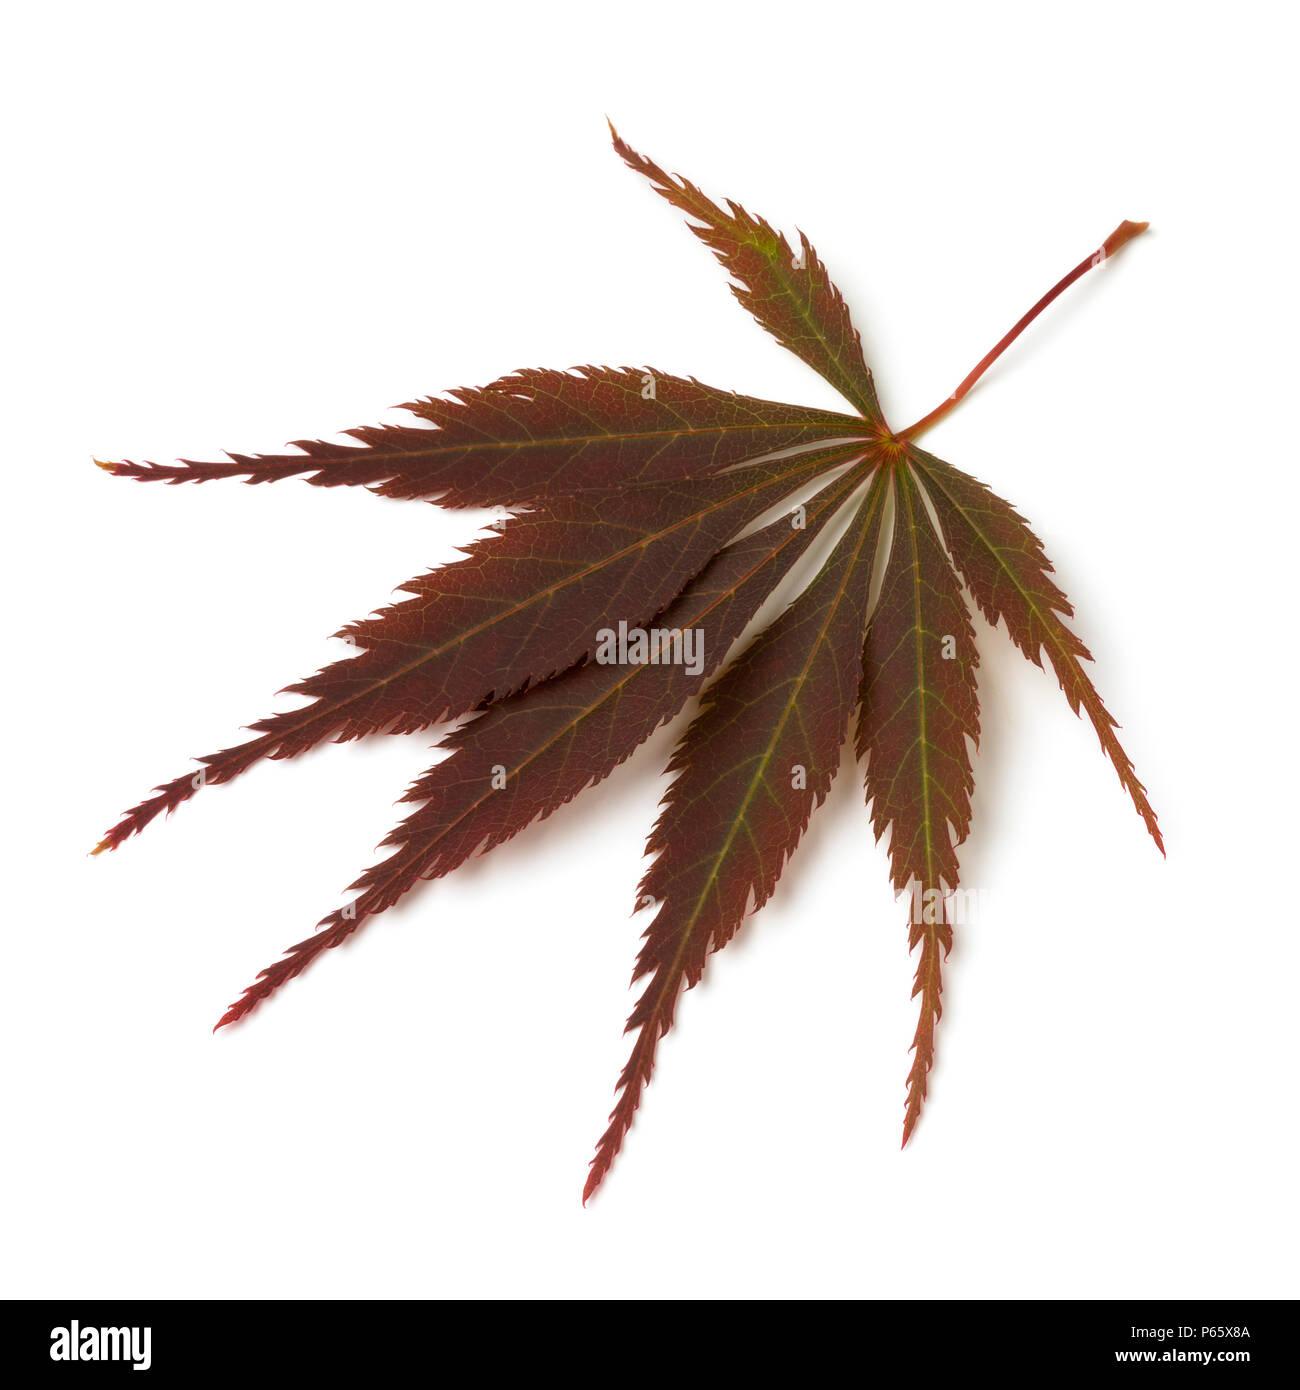 Single fresh brown Japanese maple leaf isolated on white background - Stock Image